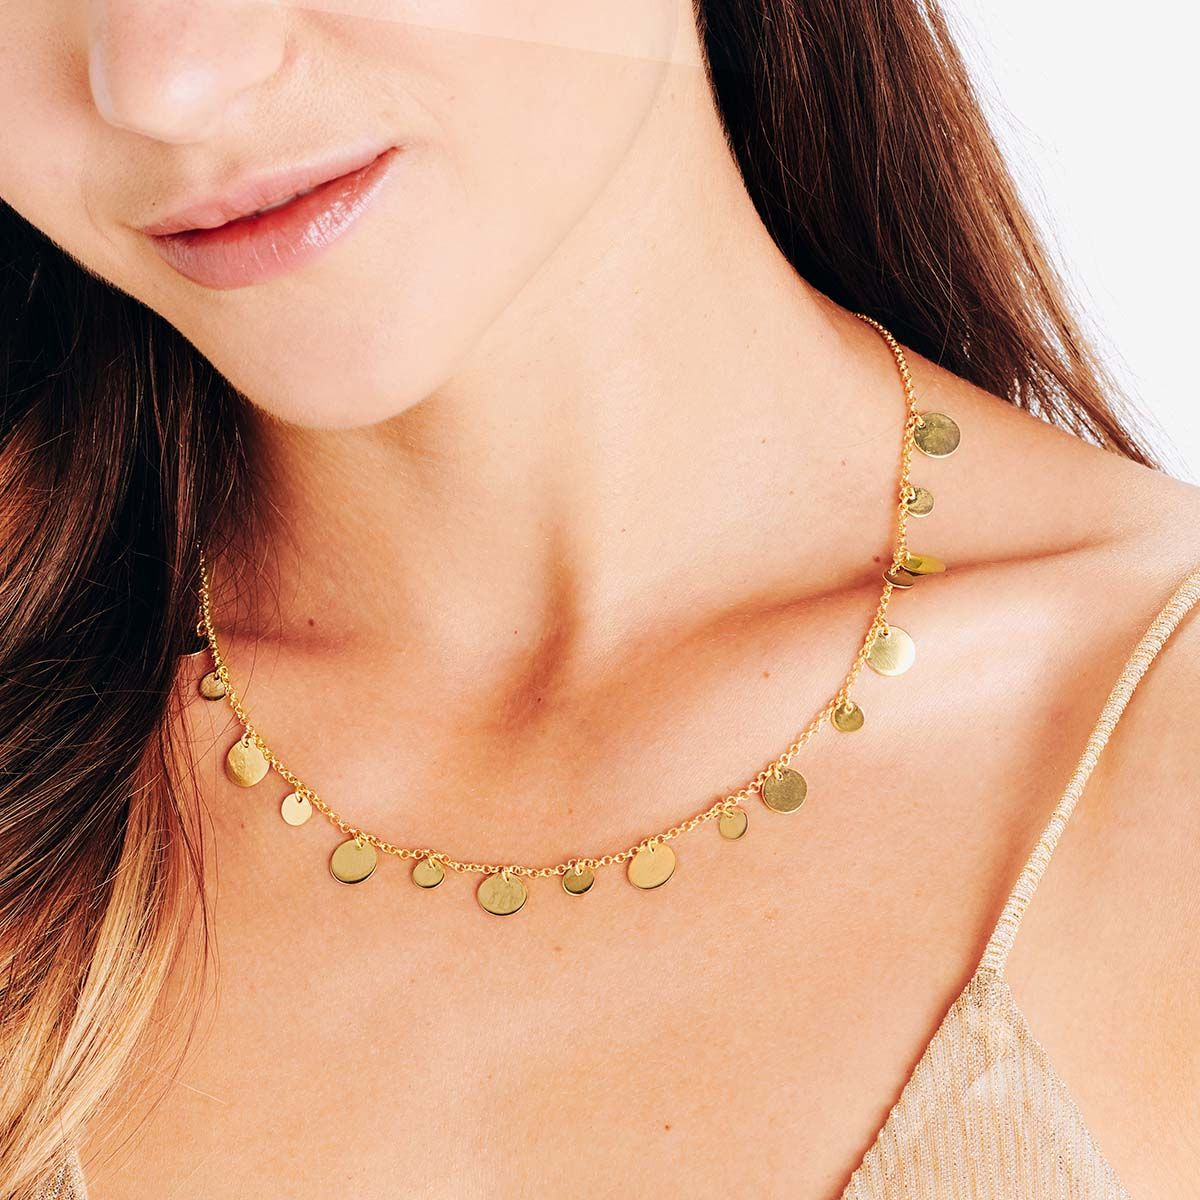 Lucie - Halsketten - 18k vergoldet